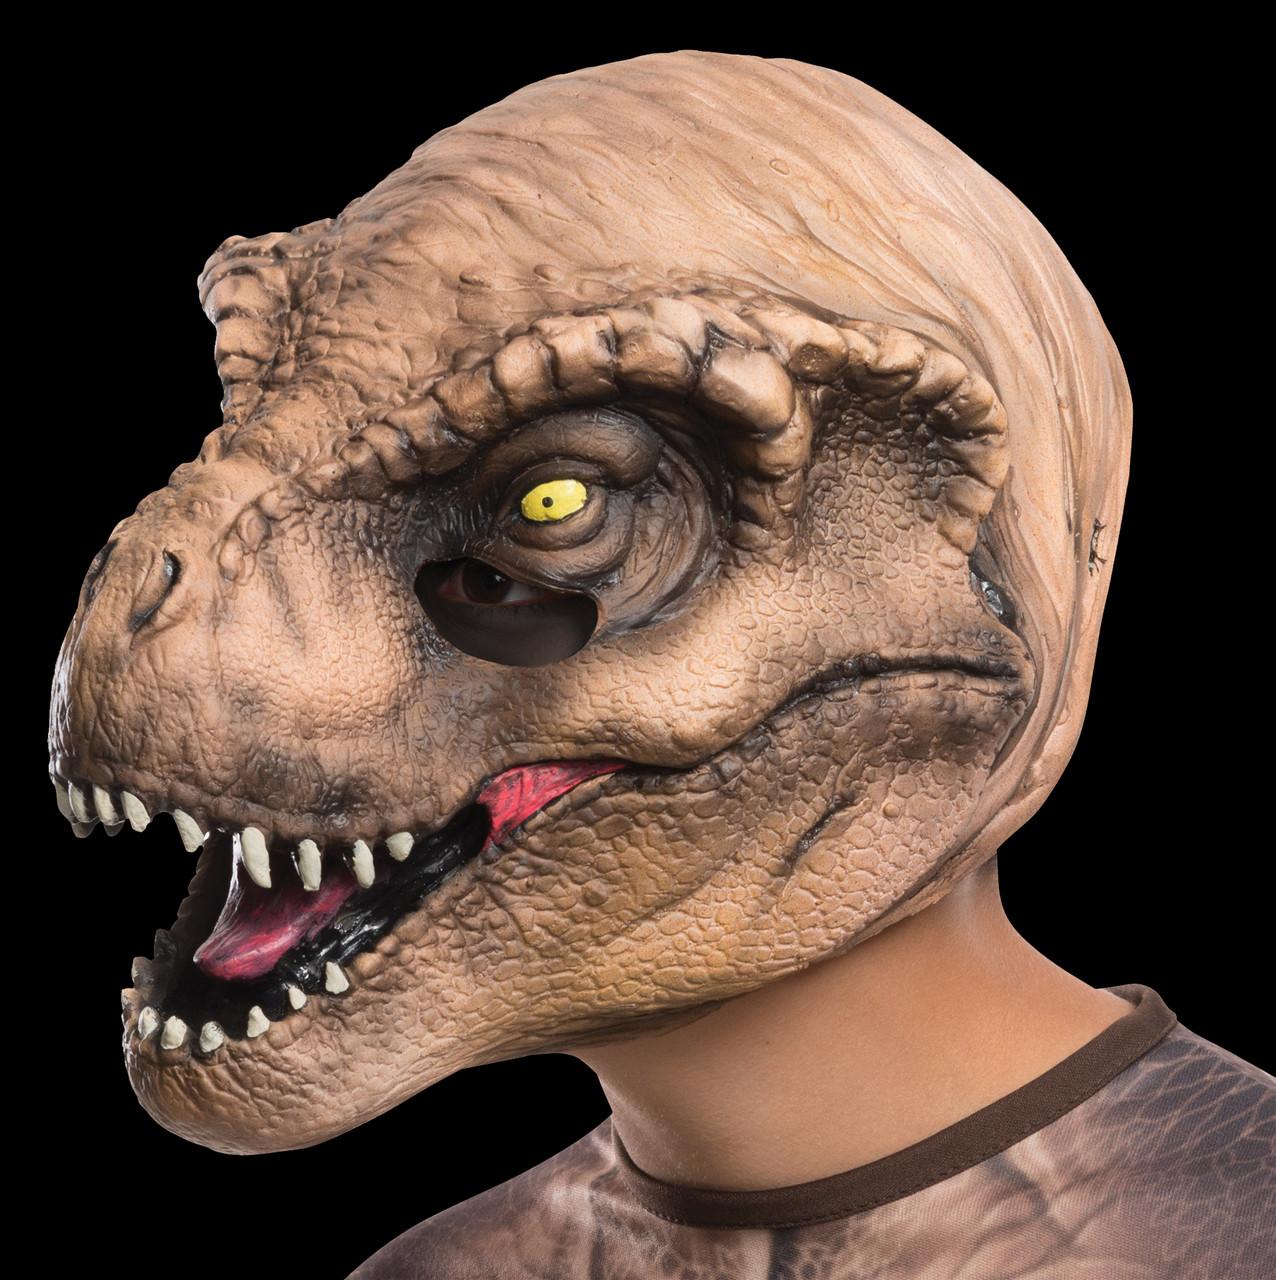 T Rex 3 Roaring In Jurassic Park Classic Campagna Trex 16s Powered By Bmw K1600 Motorcycle Magazine 4 Child World Tyrannosaurus Dinosaur Halloween